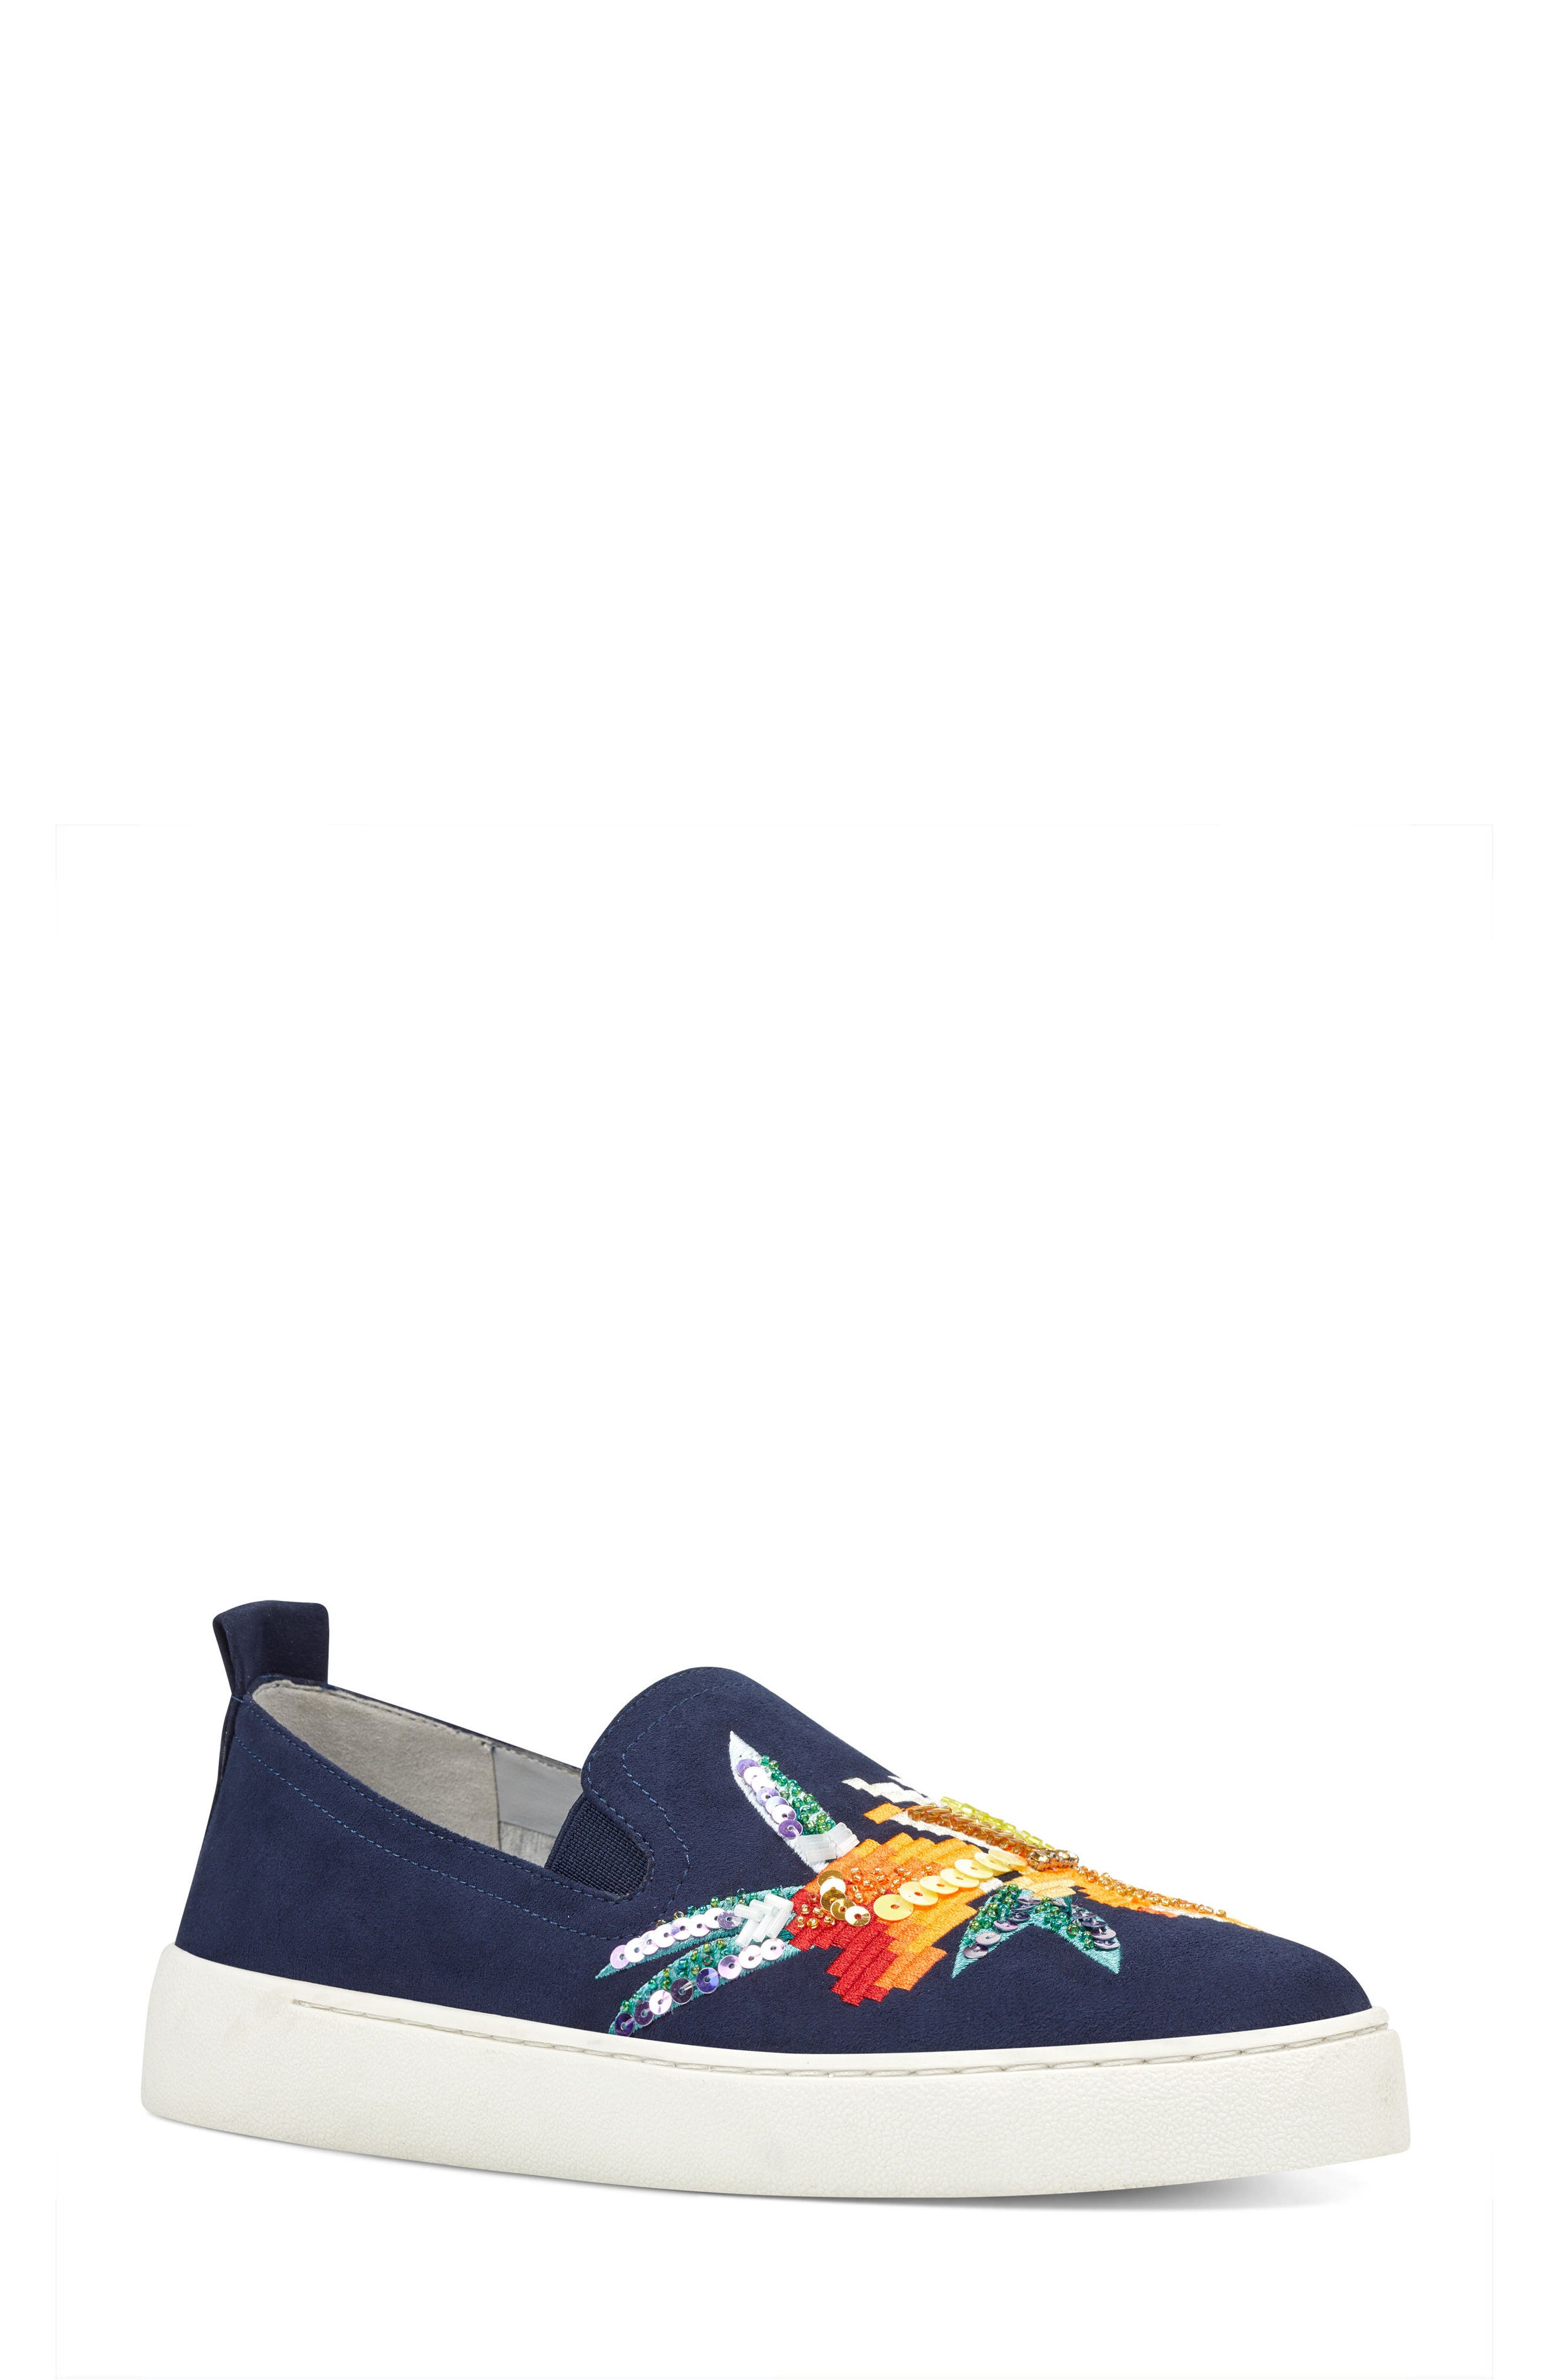 Playavista Slip-On Sneaker,                         Main,                         color, Navy Suede